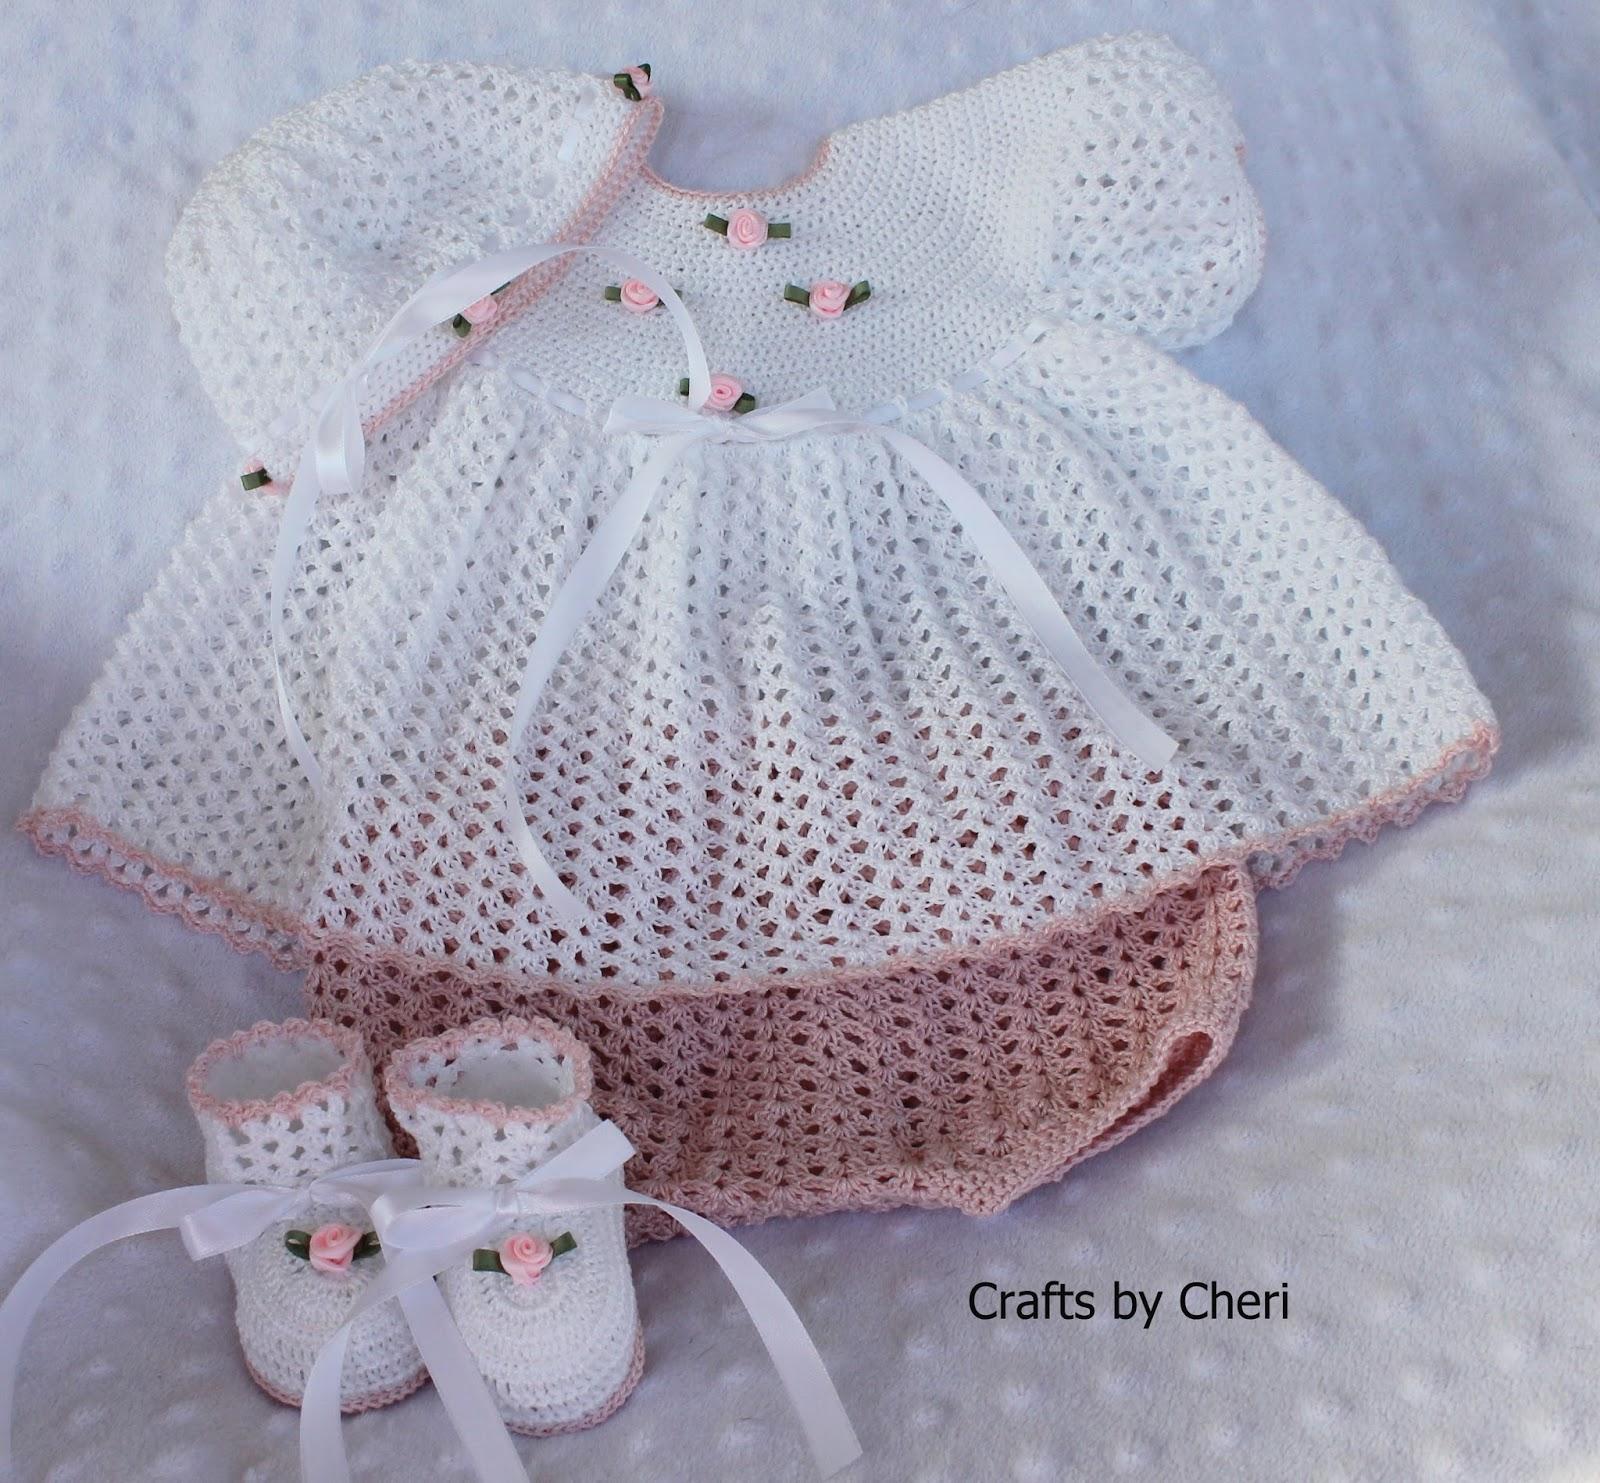 Crochet Pattern For Doll Diaper : Cheris Crochet Baby or reborn baby doll clothing or ...